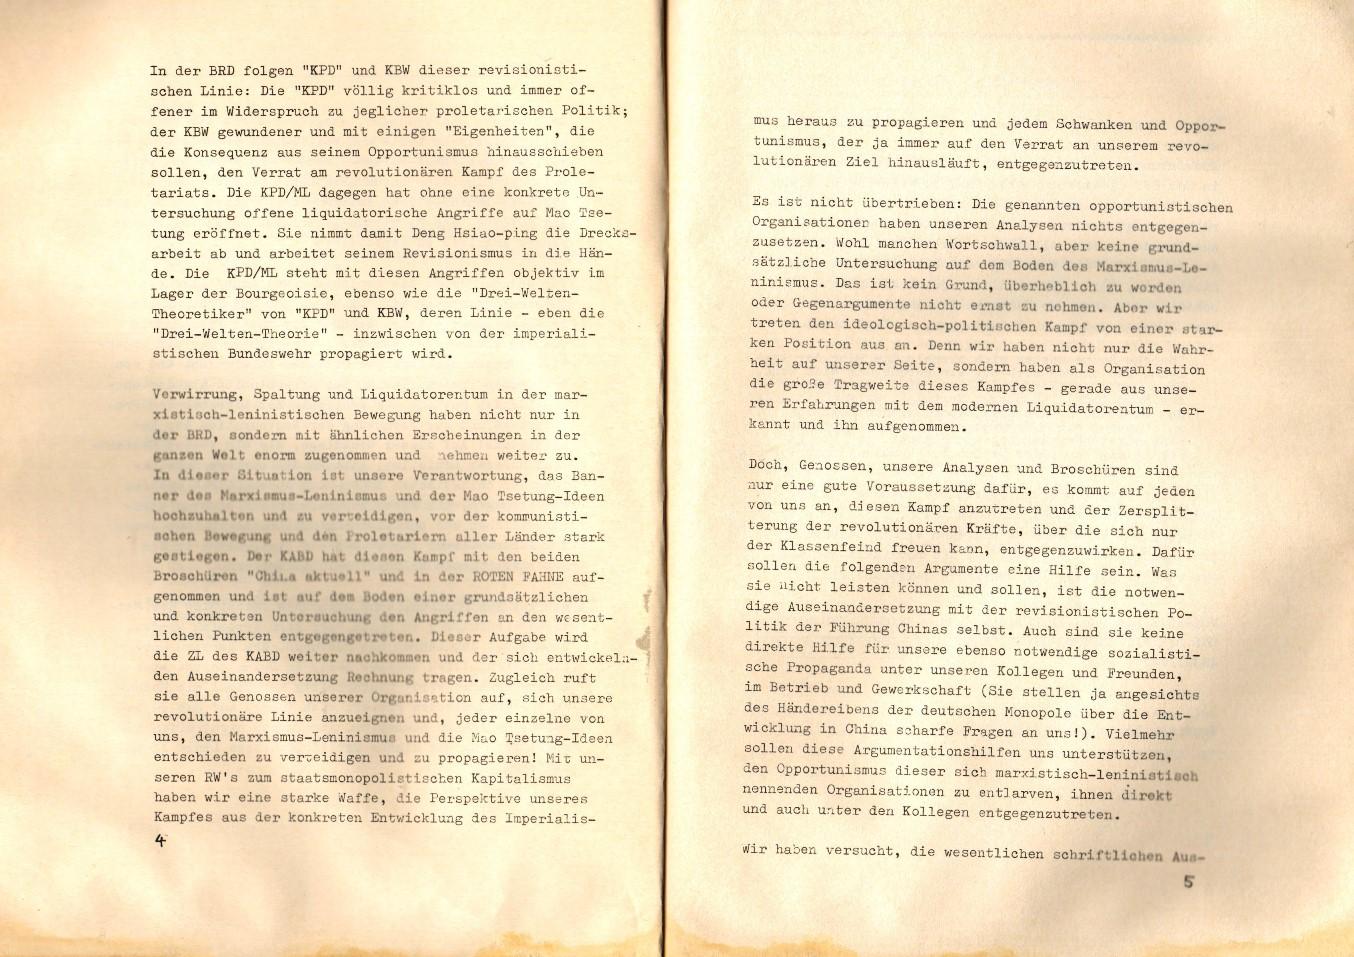 KABD_1978_Argumentationshilfen_04